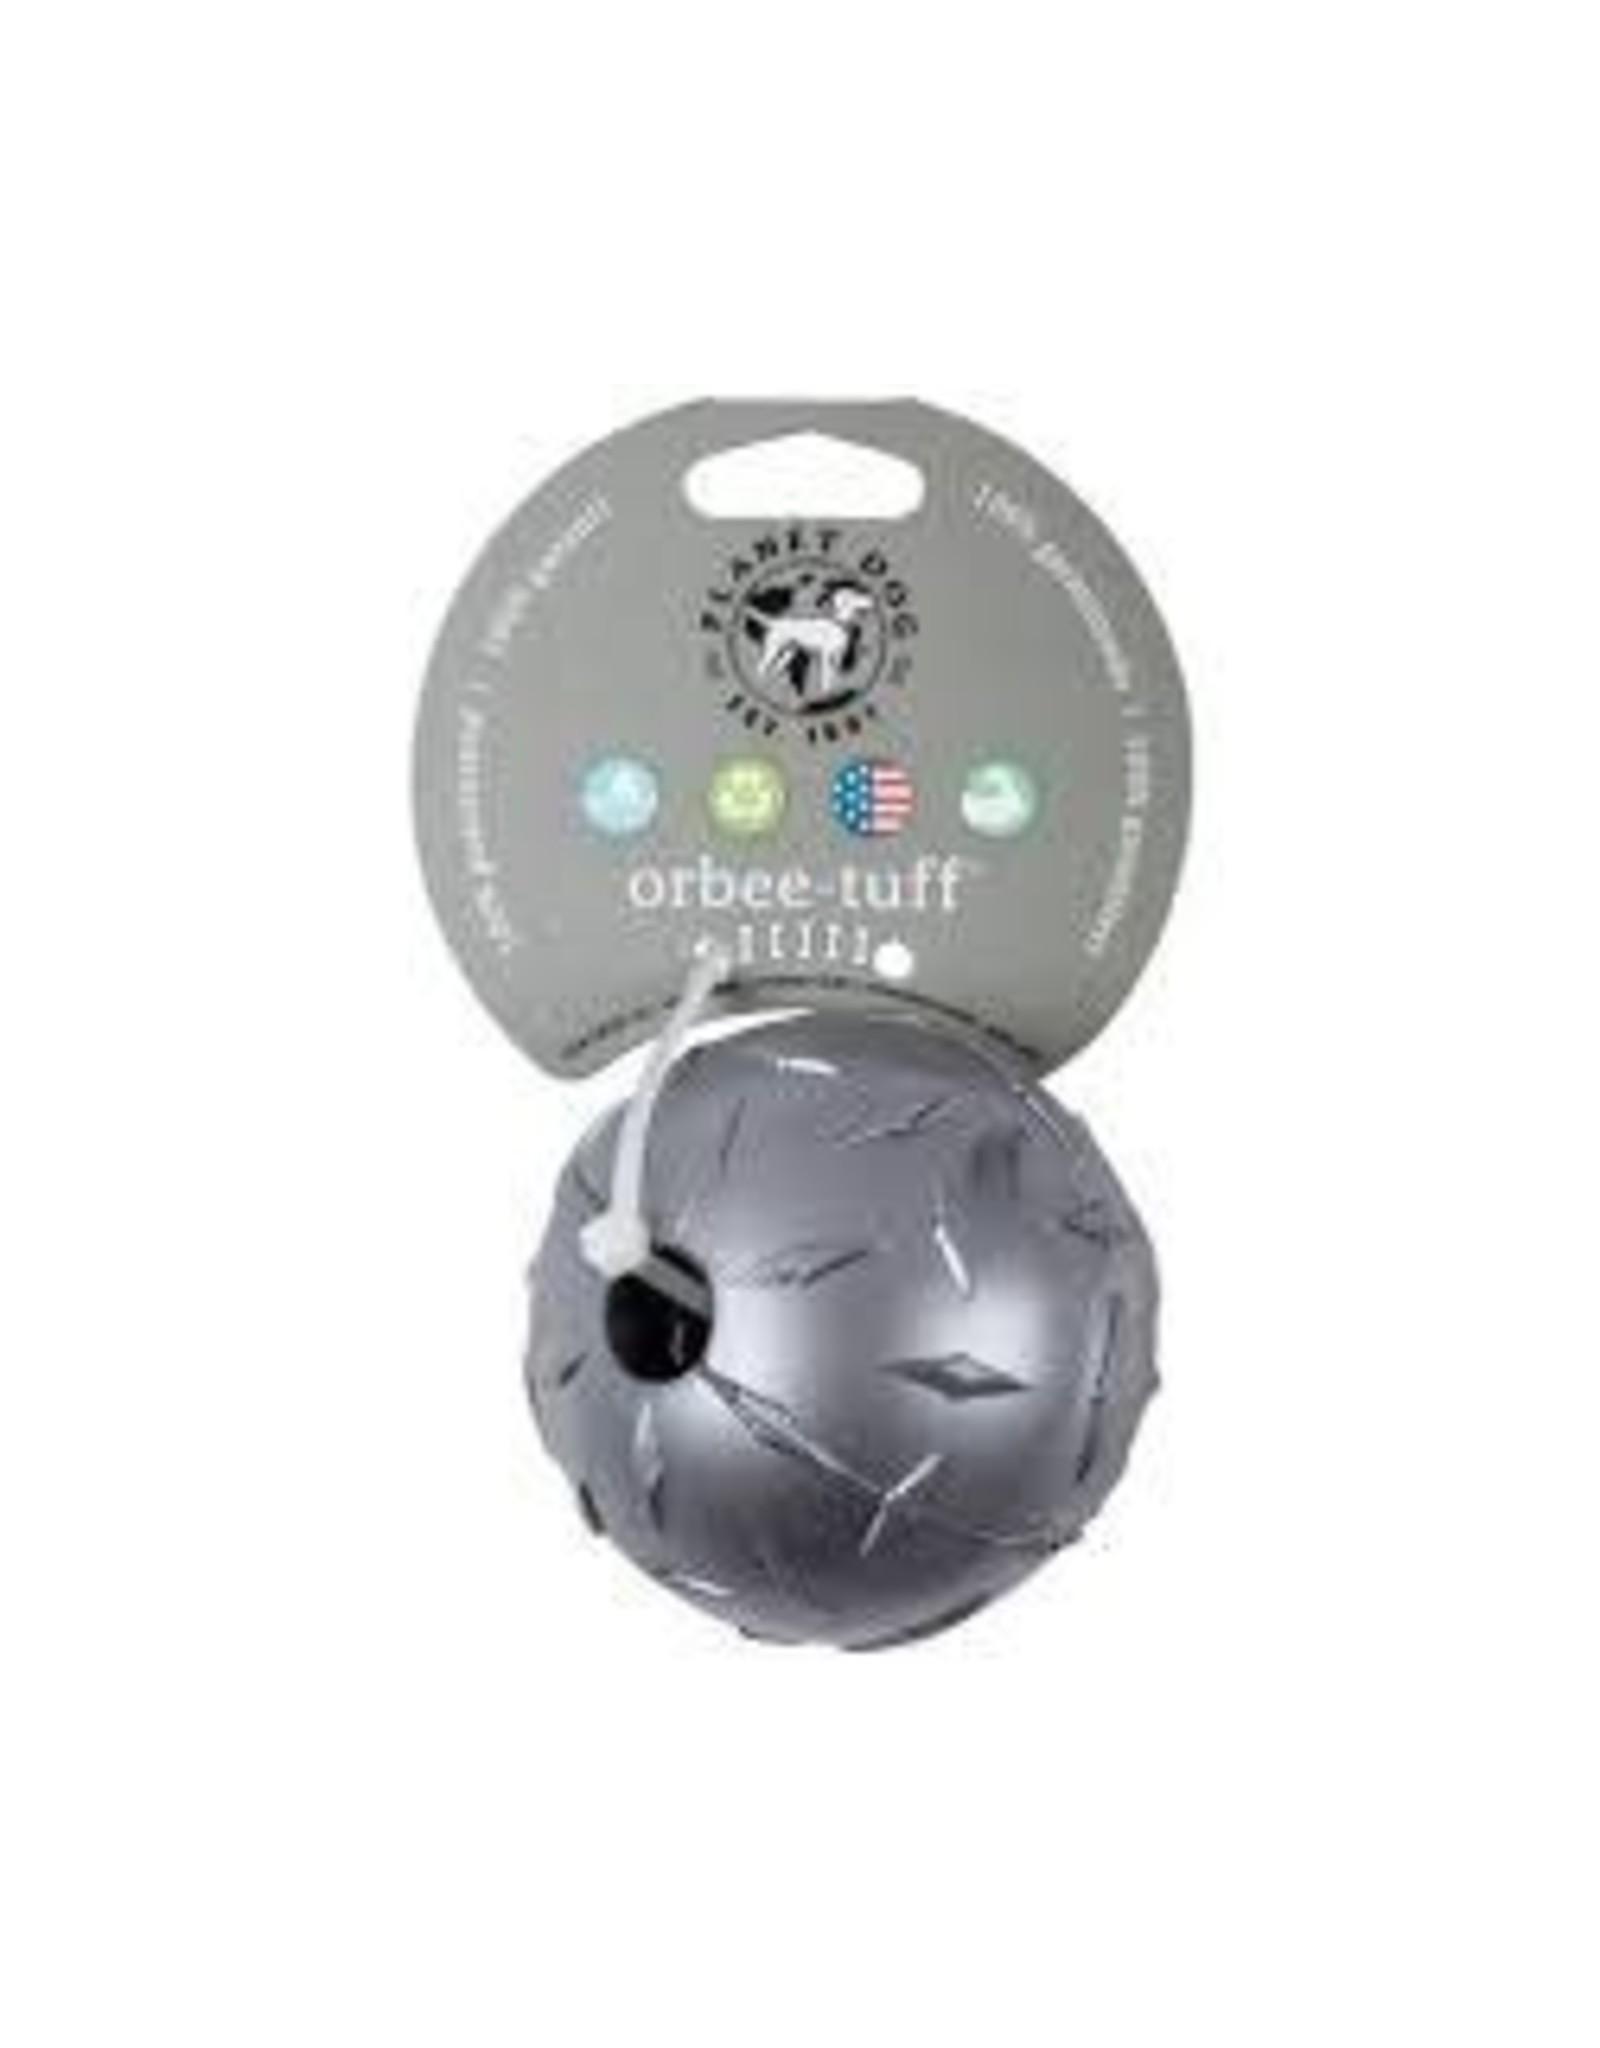 PLANET DOG PLANET DOG ORBEE TUFF DIAMOND BALL MED